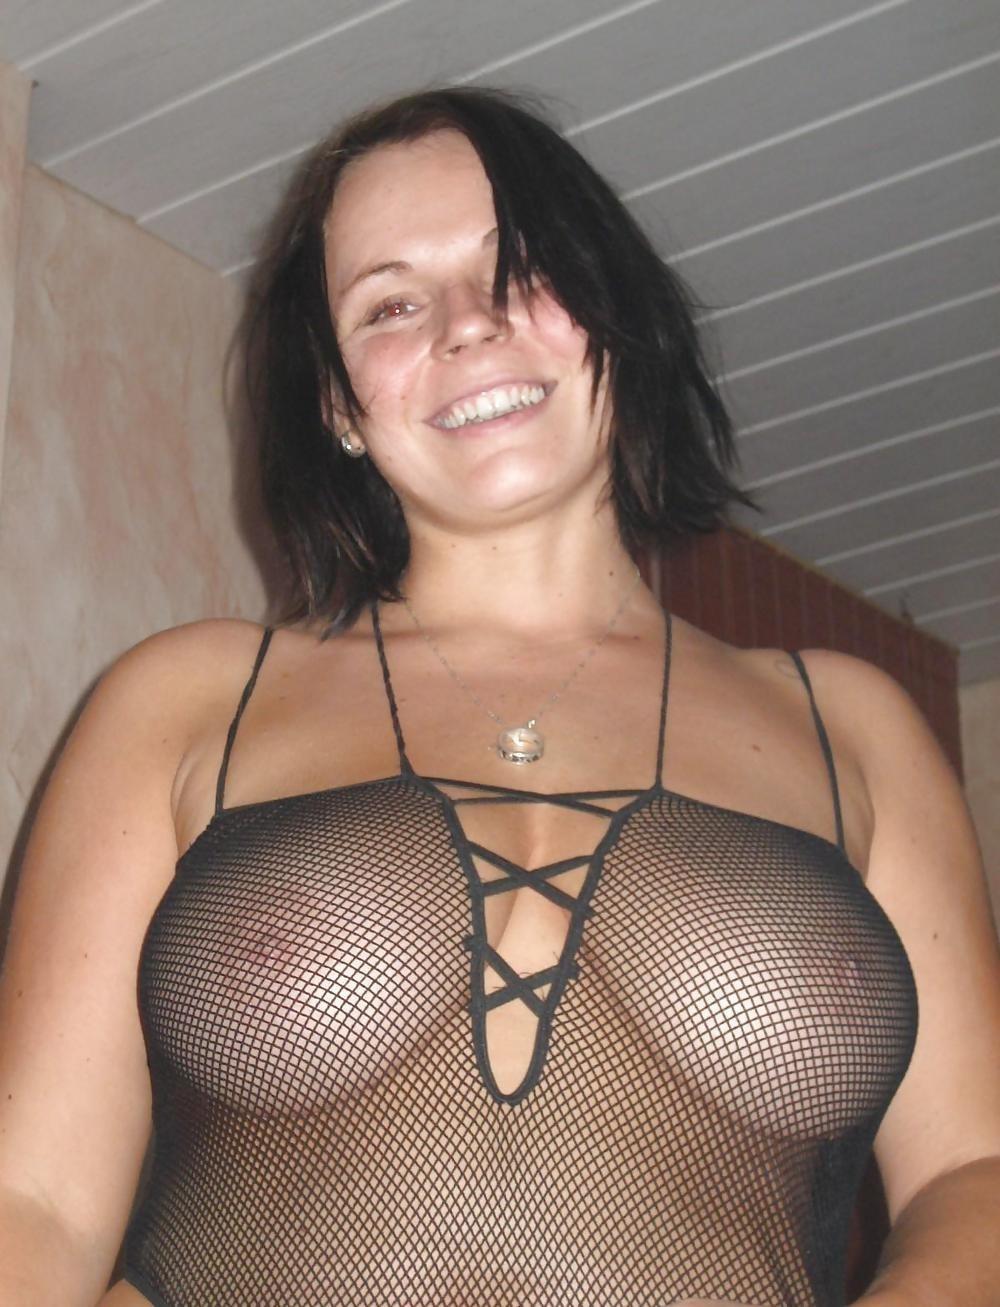 Vintage big tits pictures-1648